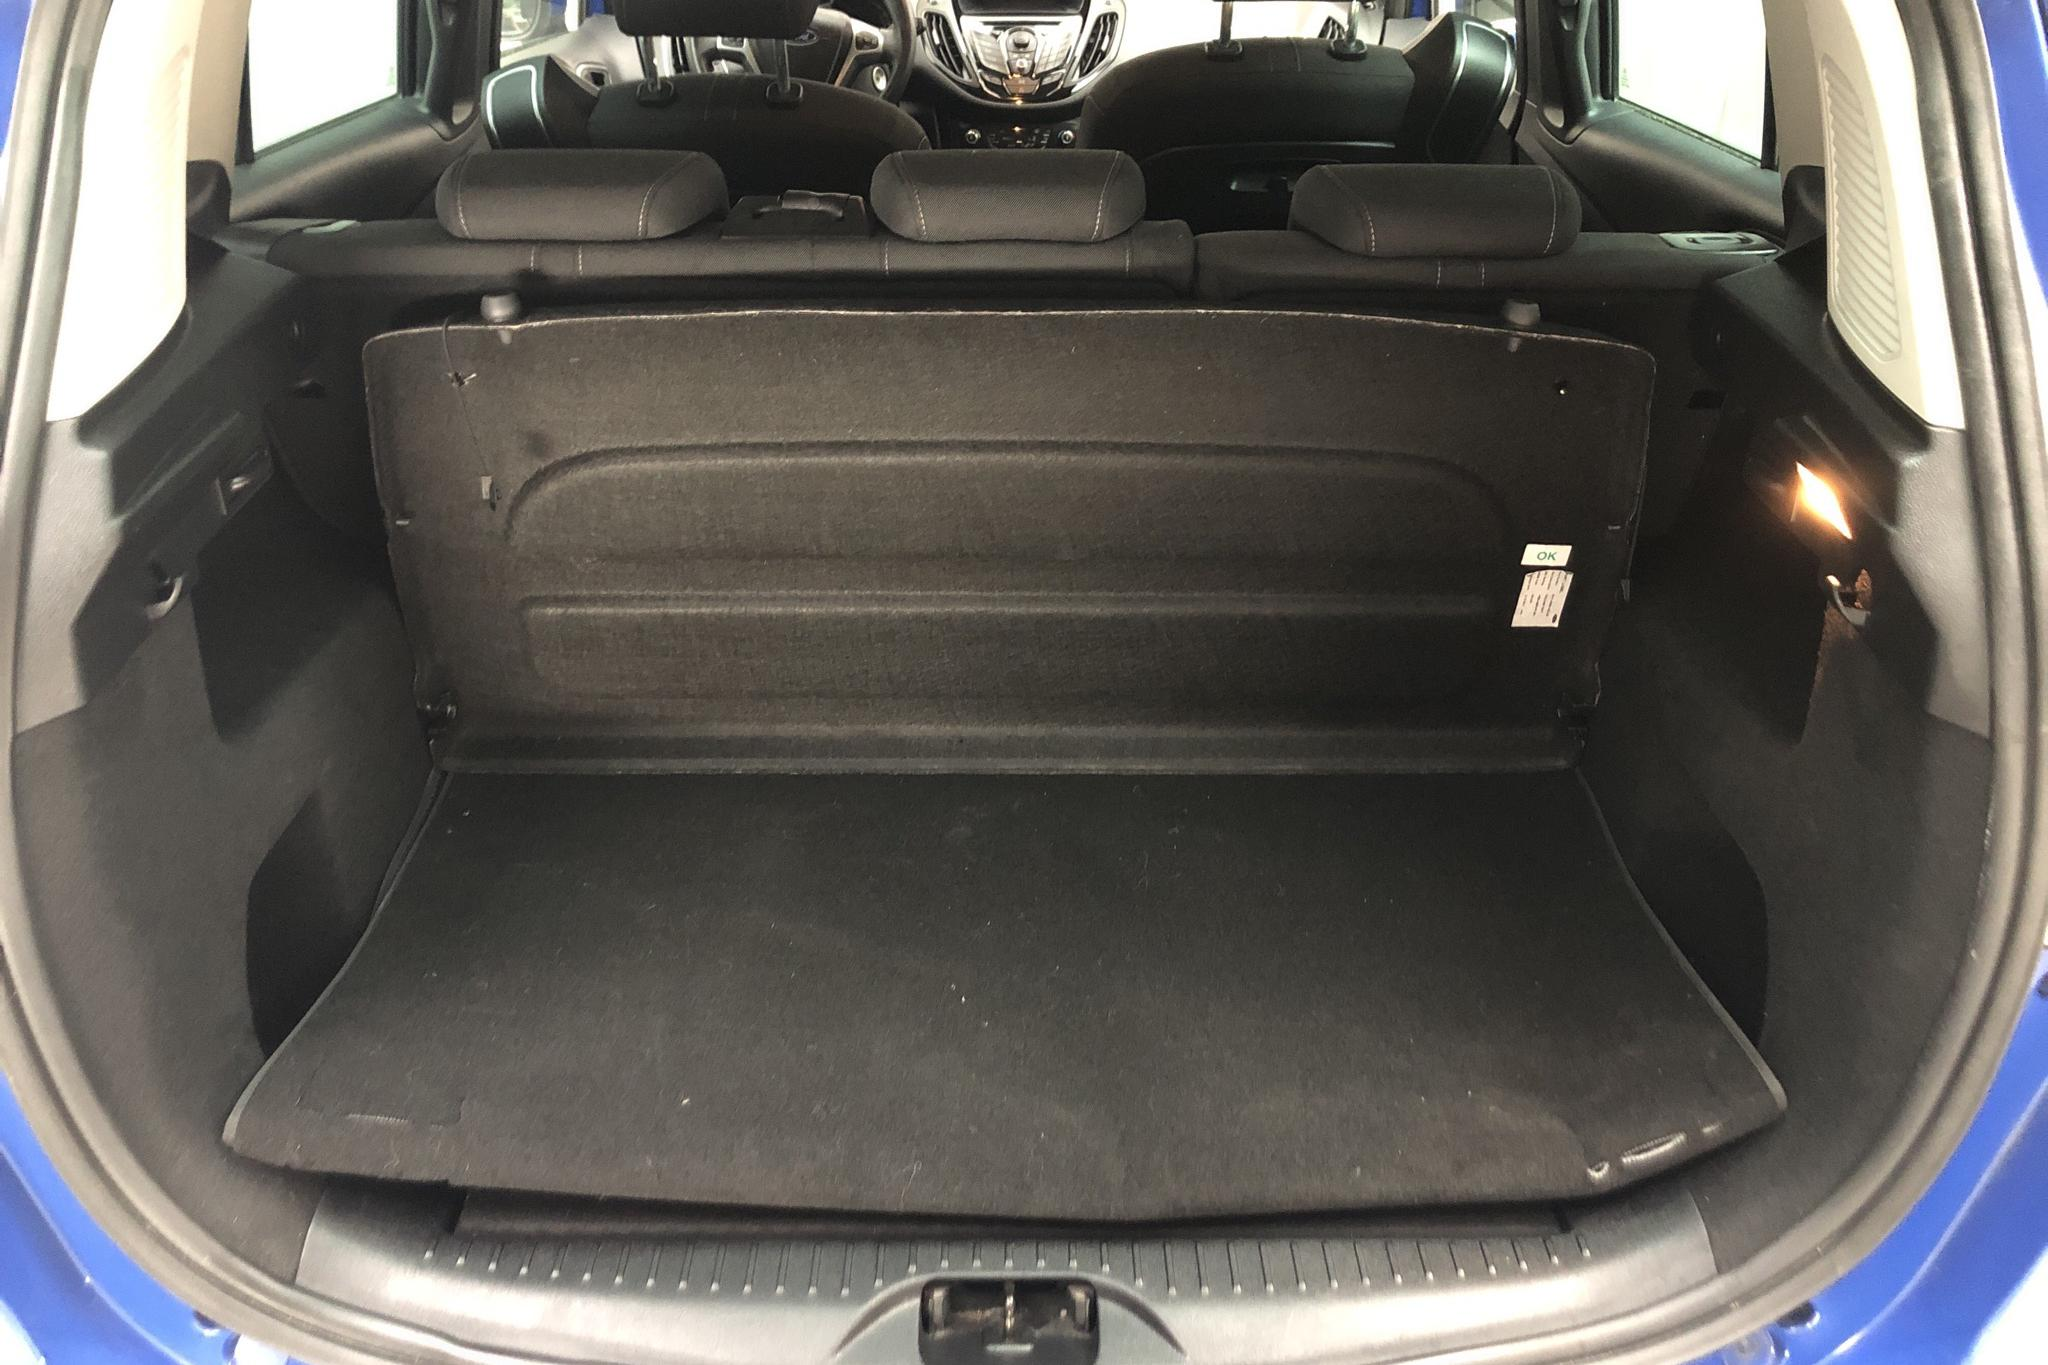 Ford B-Max 1.0 Ecoboost (100hk) - 59 740 km - Manual - blue - 2013